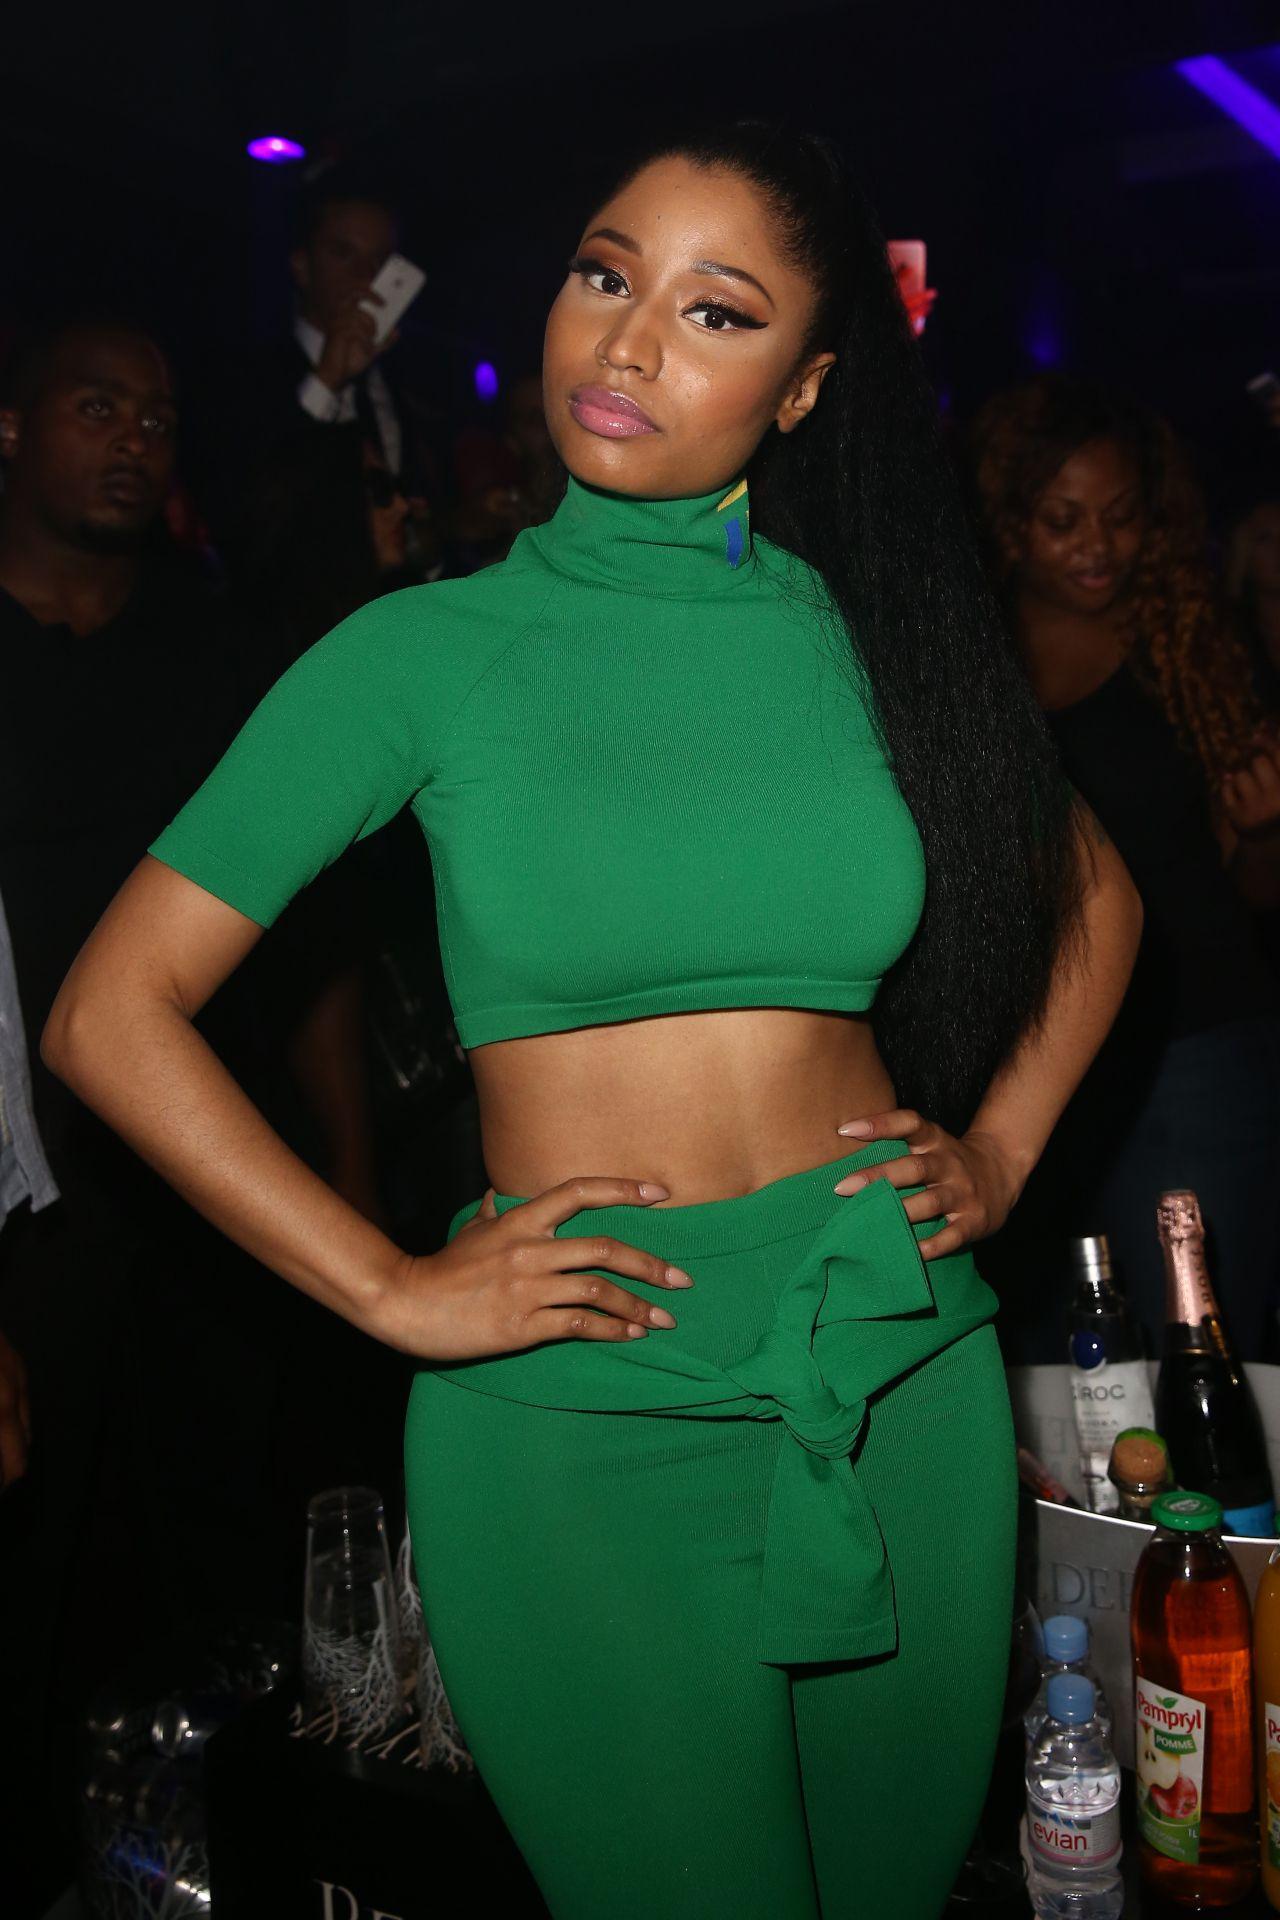 Nicki Minaj Performs During a Party at Club 79 in Paris - Sept. 2014